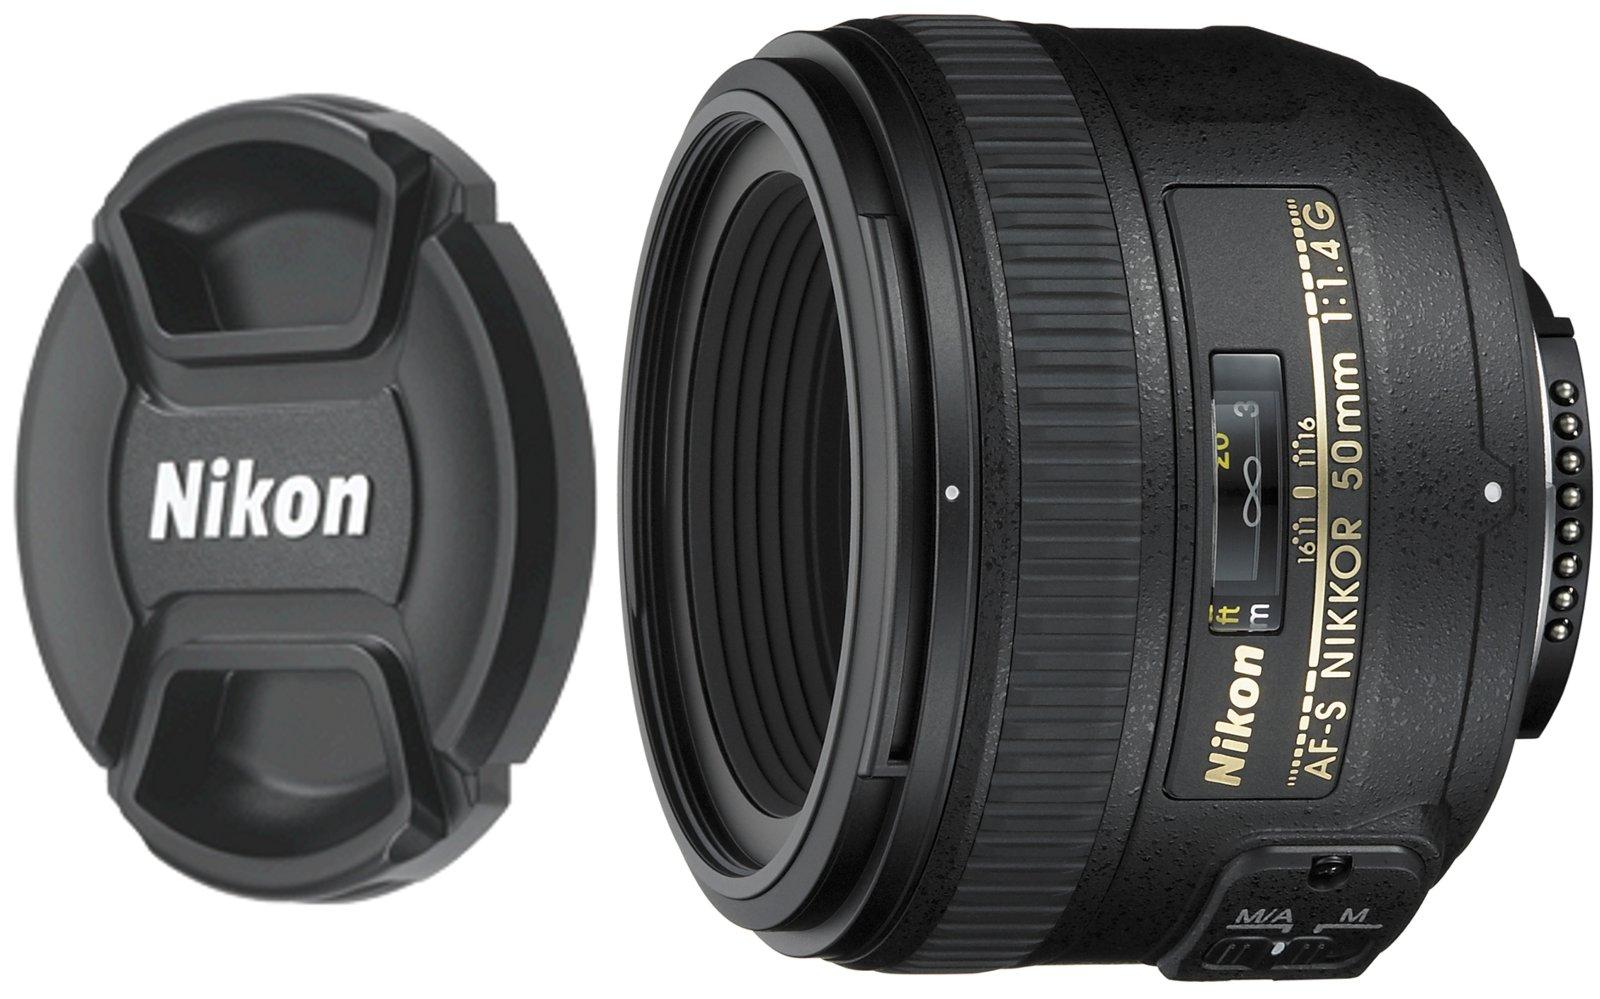 http://g-ecx.images-amazon.com/images/G/02/uk-electronics/product_content/Nikon/ECS-NK1303201-B001GCVA0U-3L-1600w999q85s10-353_4747_LC-58-58mm-Snap-on-Lens-Cap_front_with_lens.jpg